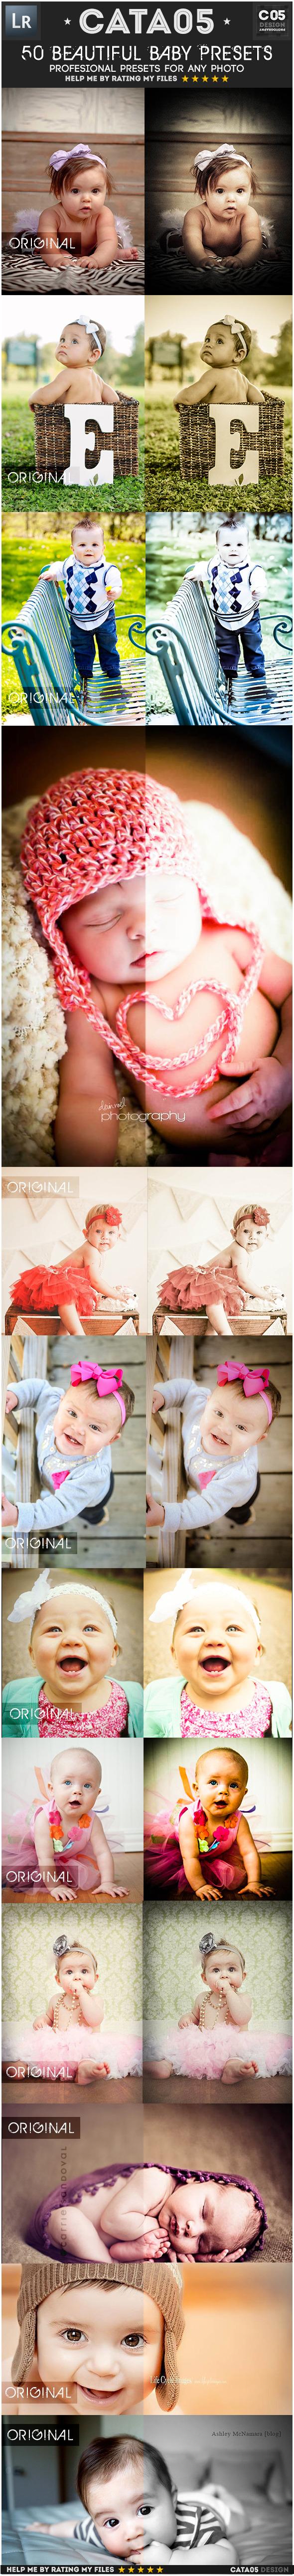 50 Beautiful Baby Presets - Portrait Lightroom Presets